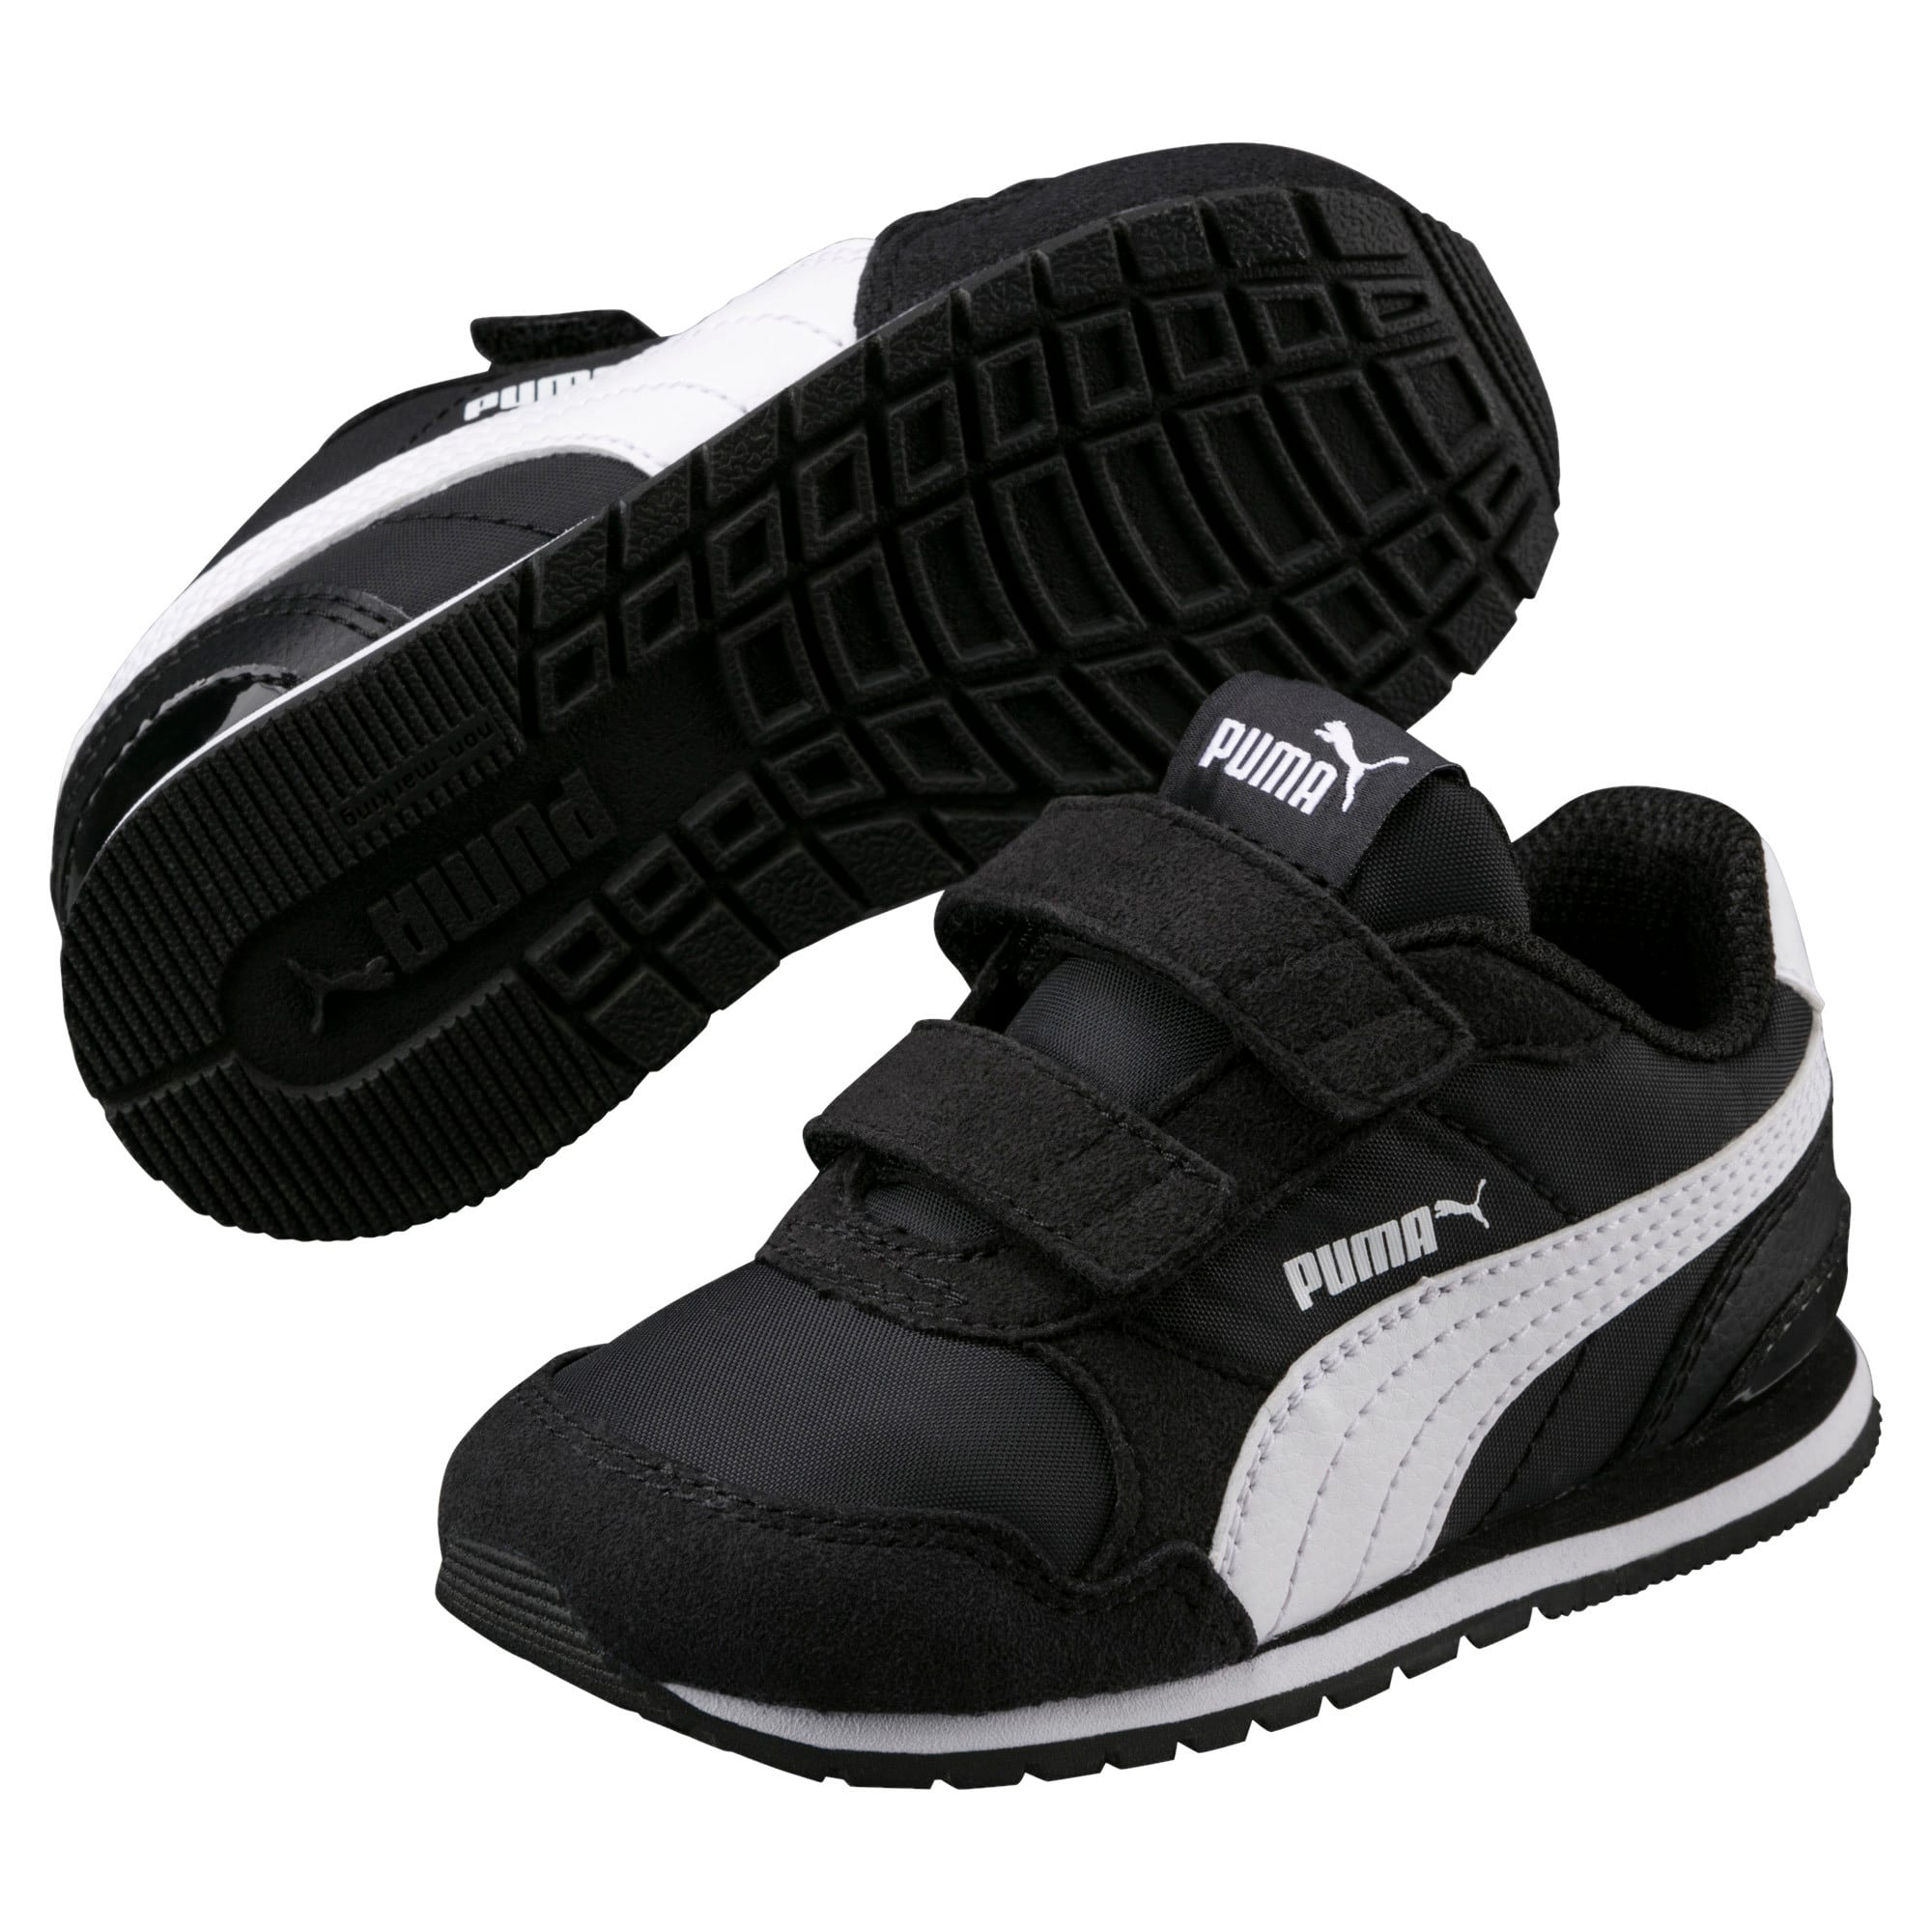 Thumbnail 2 of ST Runner v2 Little Kids' Shoes, Puma Black-Puma White, medium